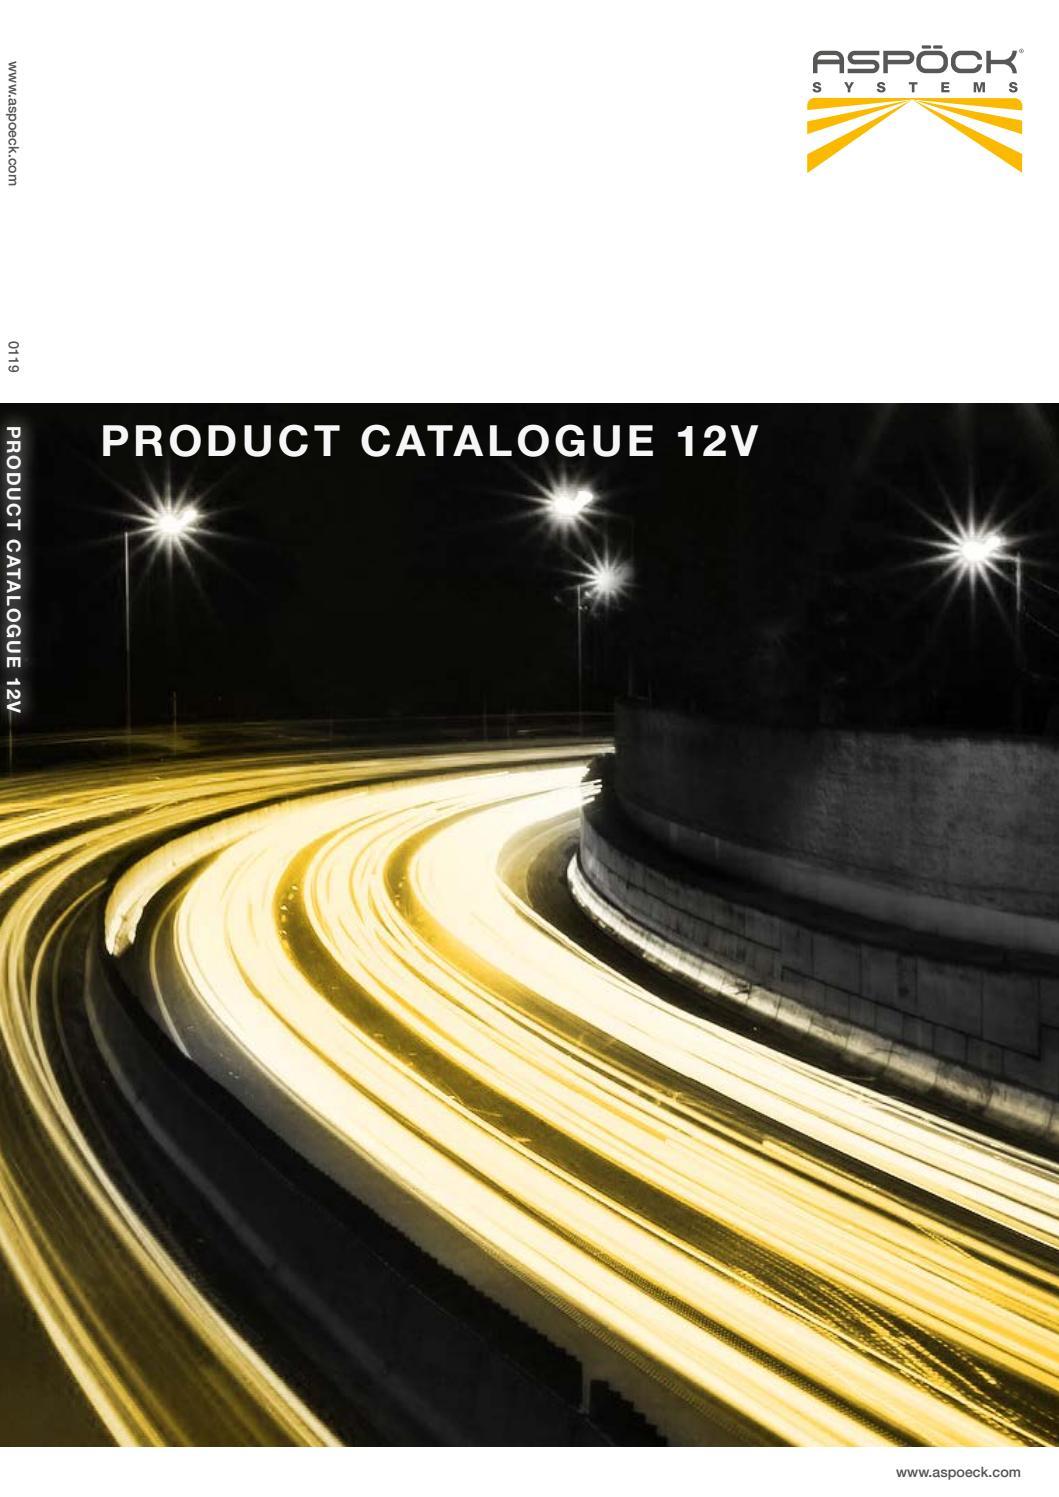 7 Pin Plastic Caravan Socket with Fog Lamp Cut Out 12V ISO 1724